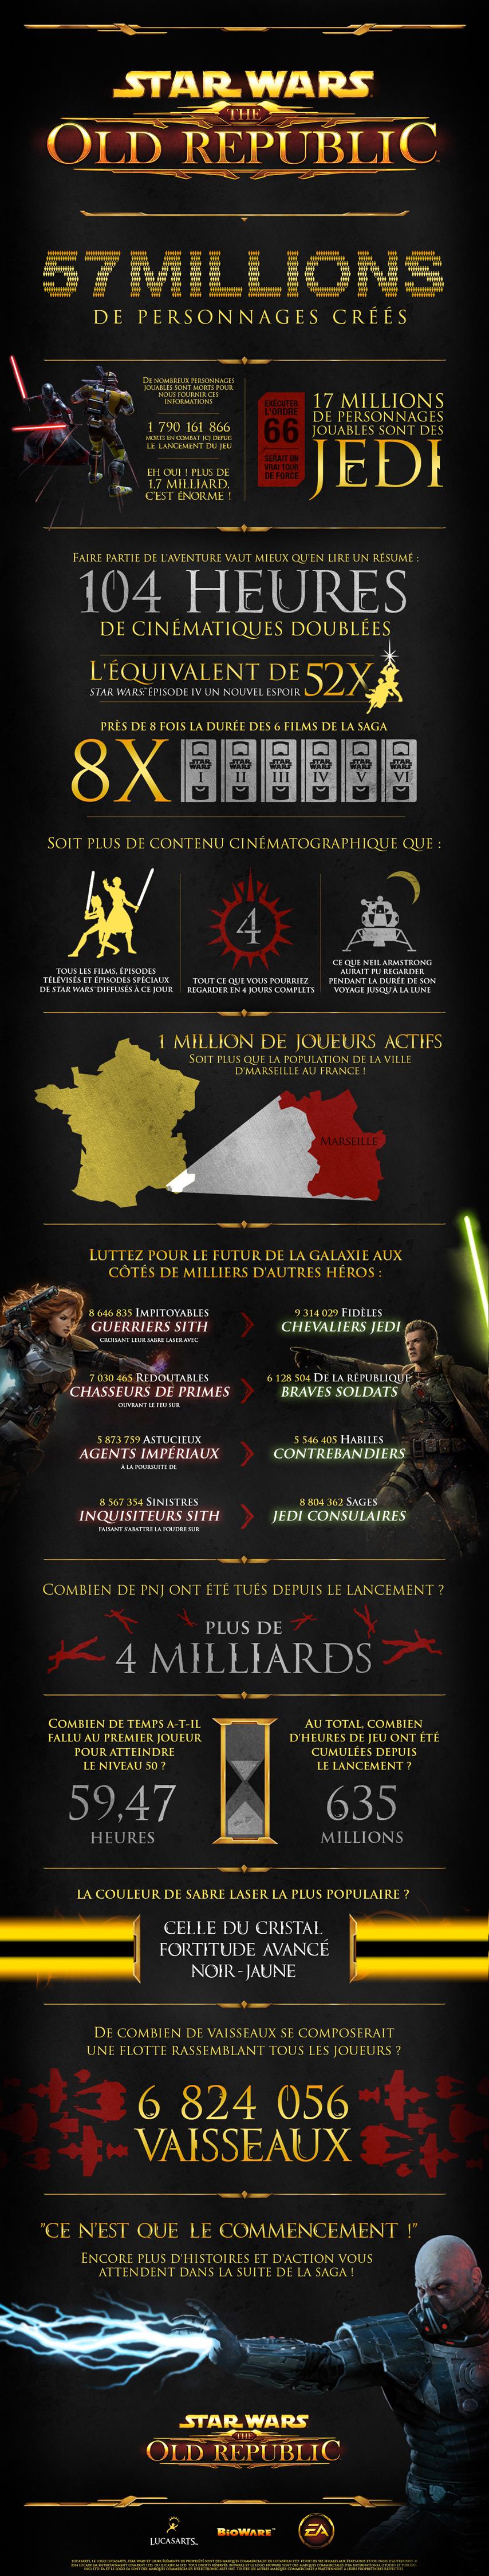 Star Wars - The Old Republic [MMORPG - PC] Swotr_info